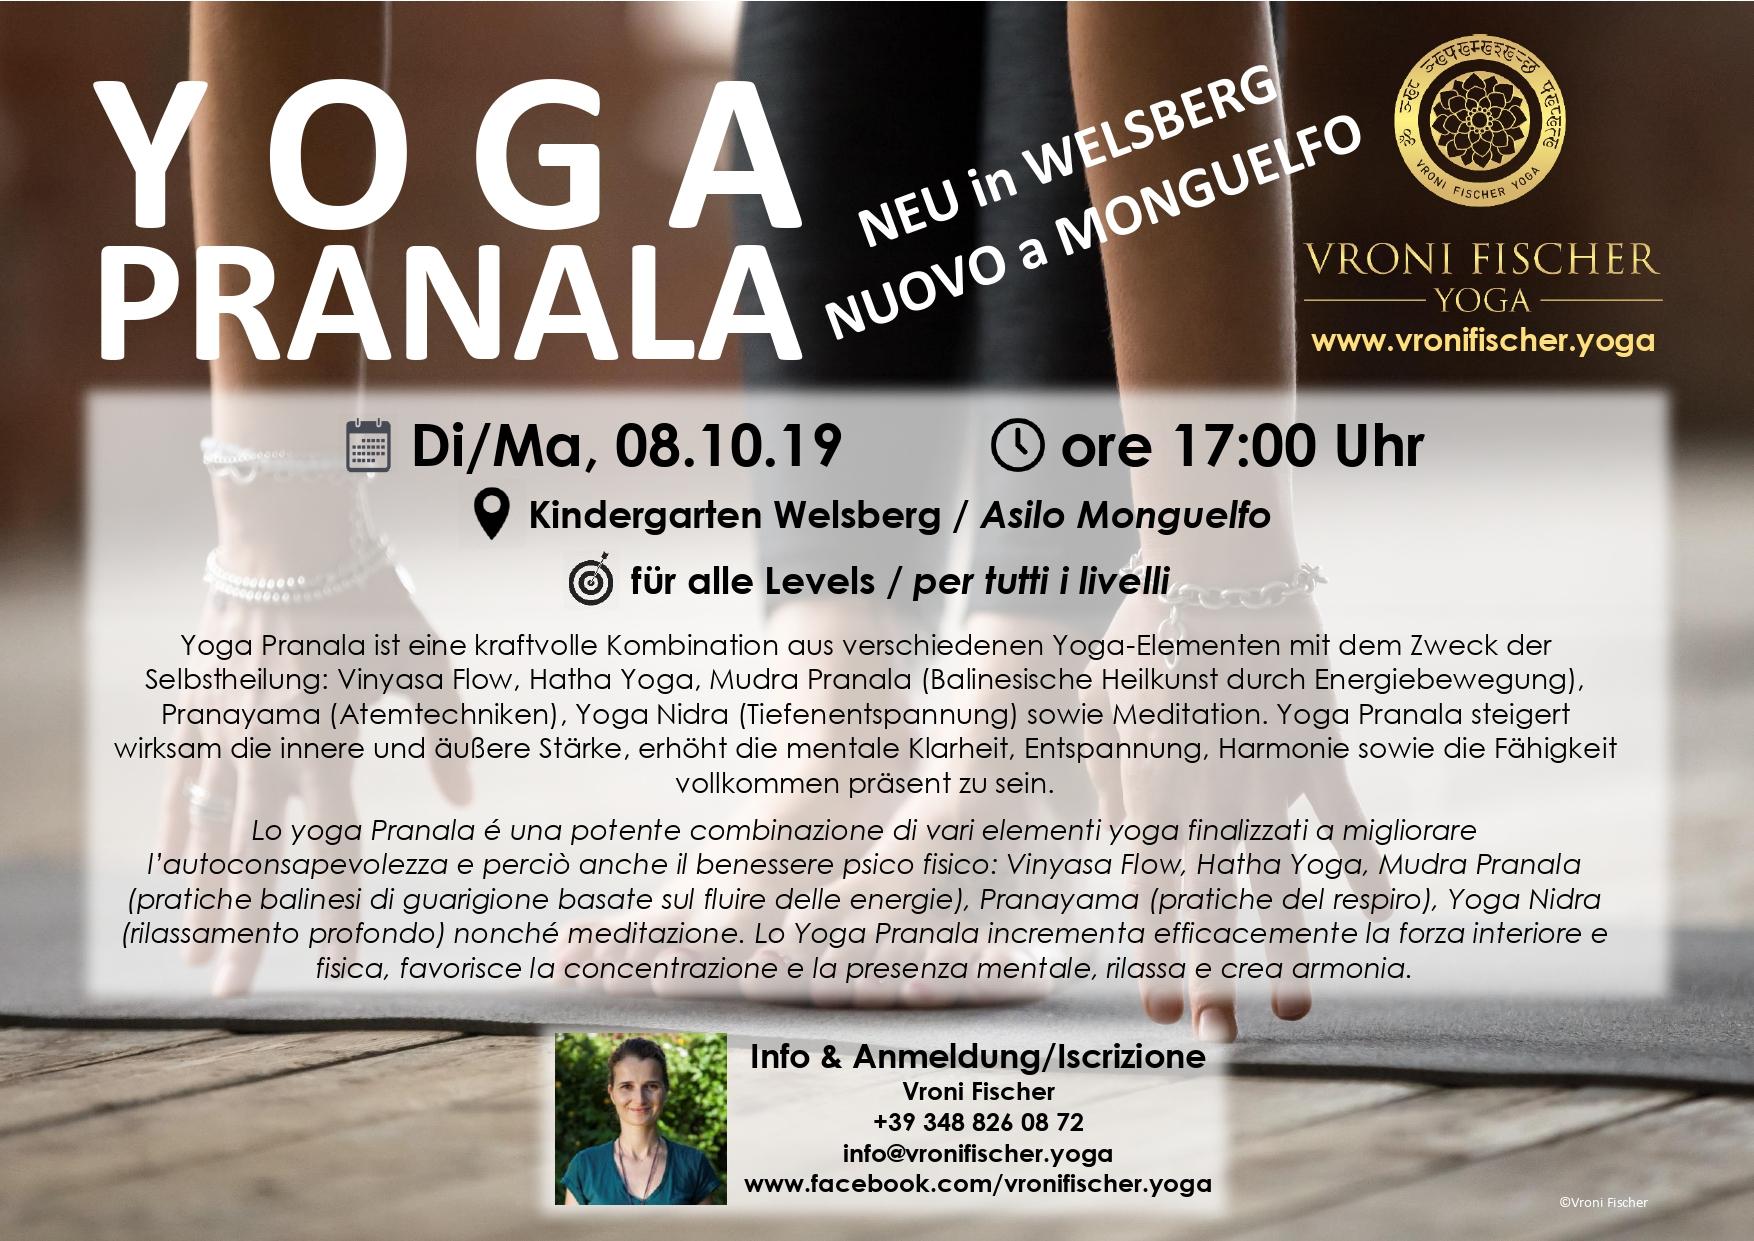 https://www.vronifischer.yoga/kurse-corsi/welsberg-monguelfo/